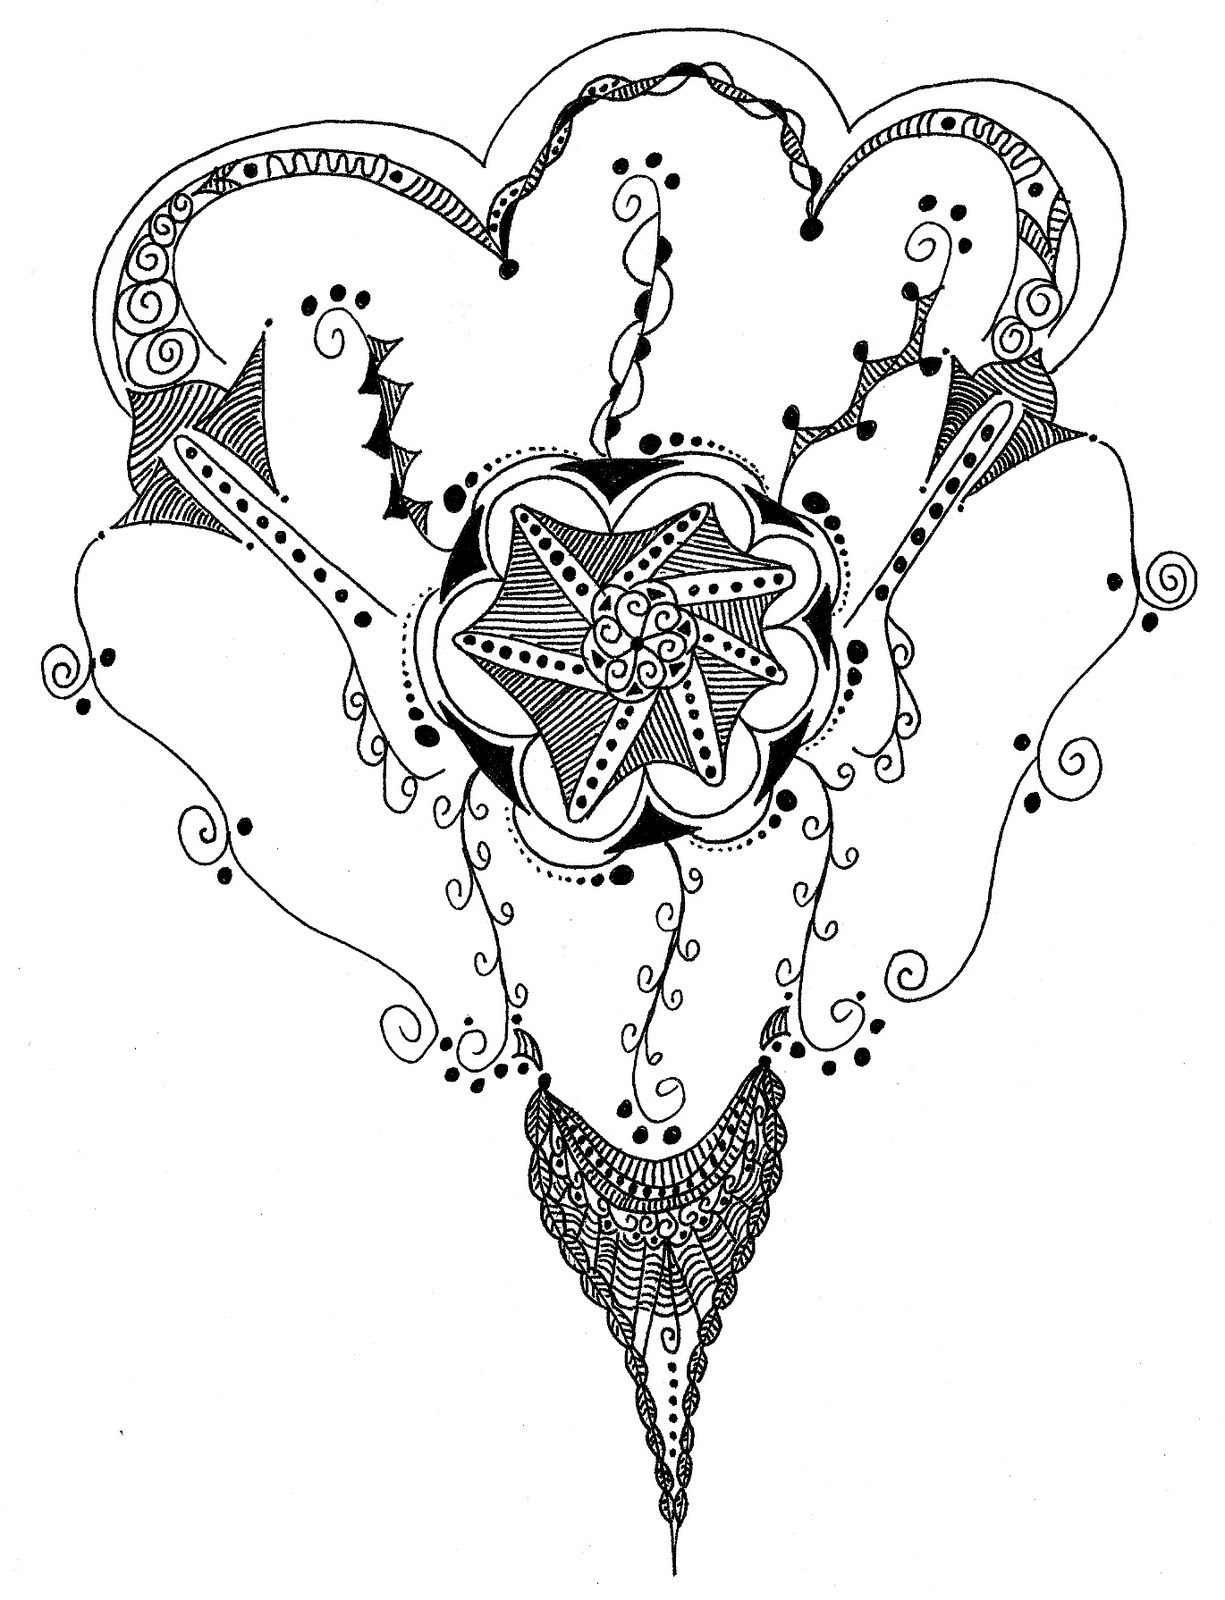 Make Something 365 & Get Unstuck: Doodle Daily